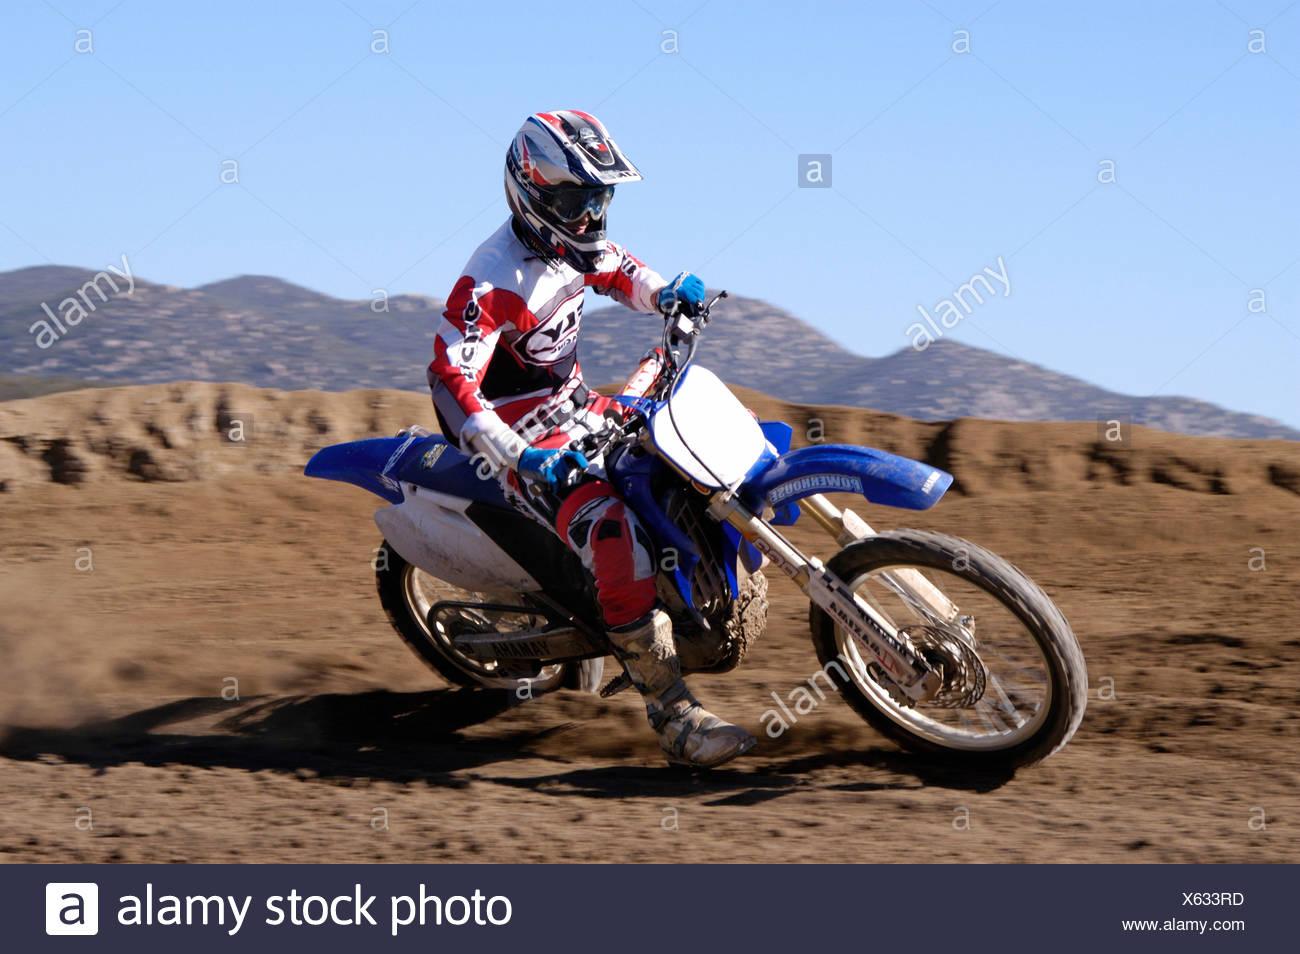 action Moto cross motor sport motorbike motorcycle running sport - Stock Image